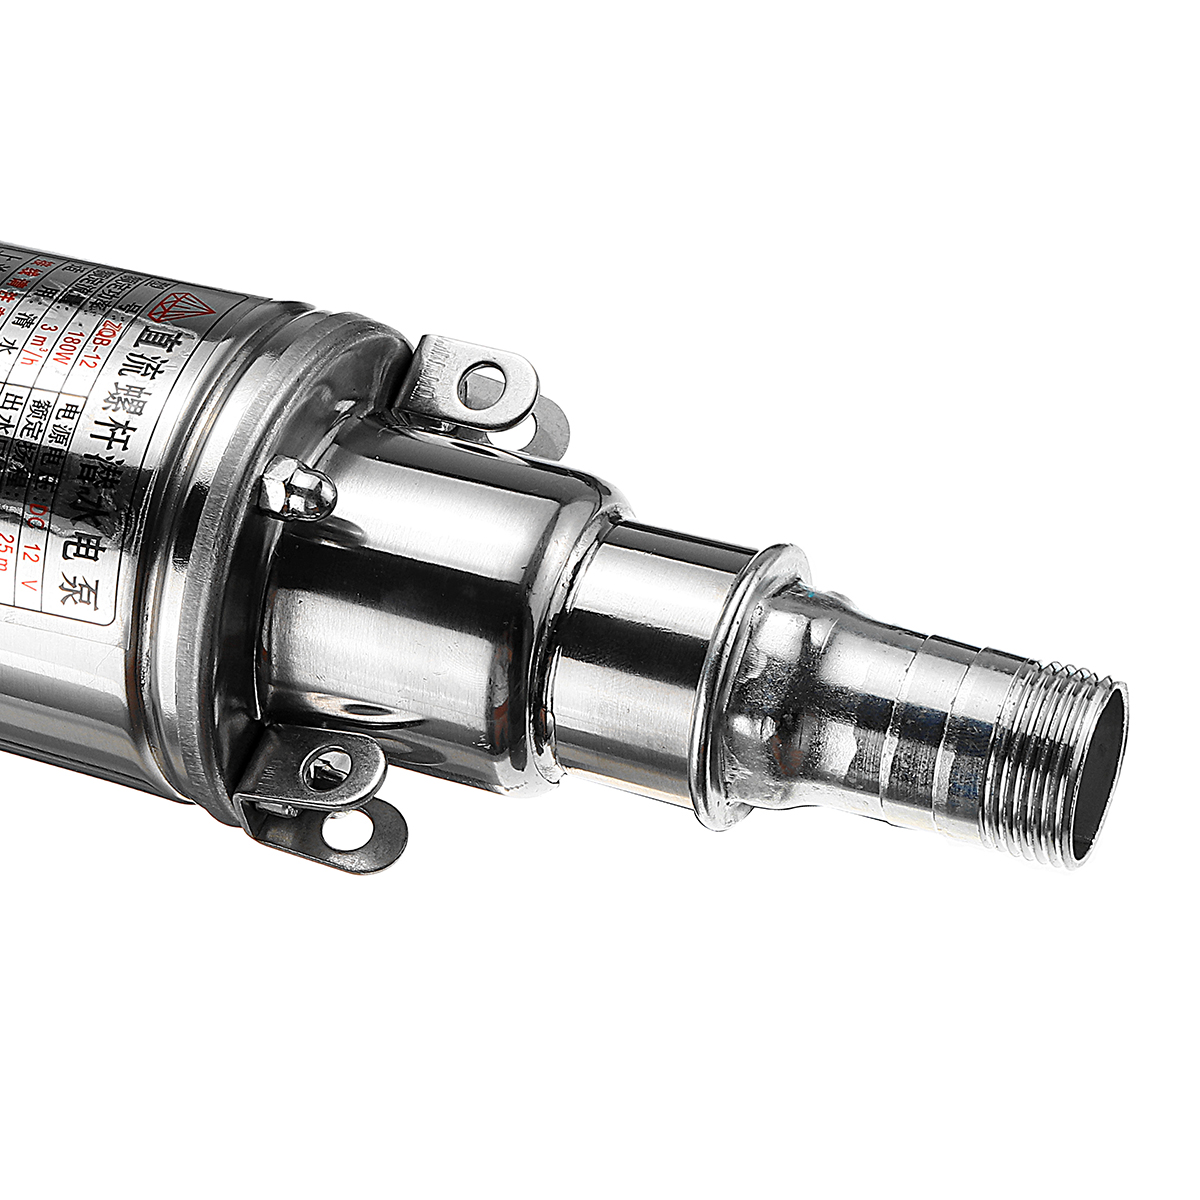 12V/24V Deep Well Pump 300W 8m3/h Solar Submersible Pump